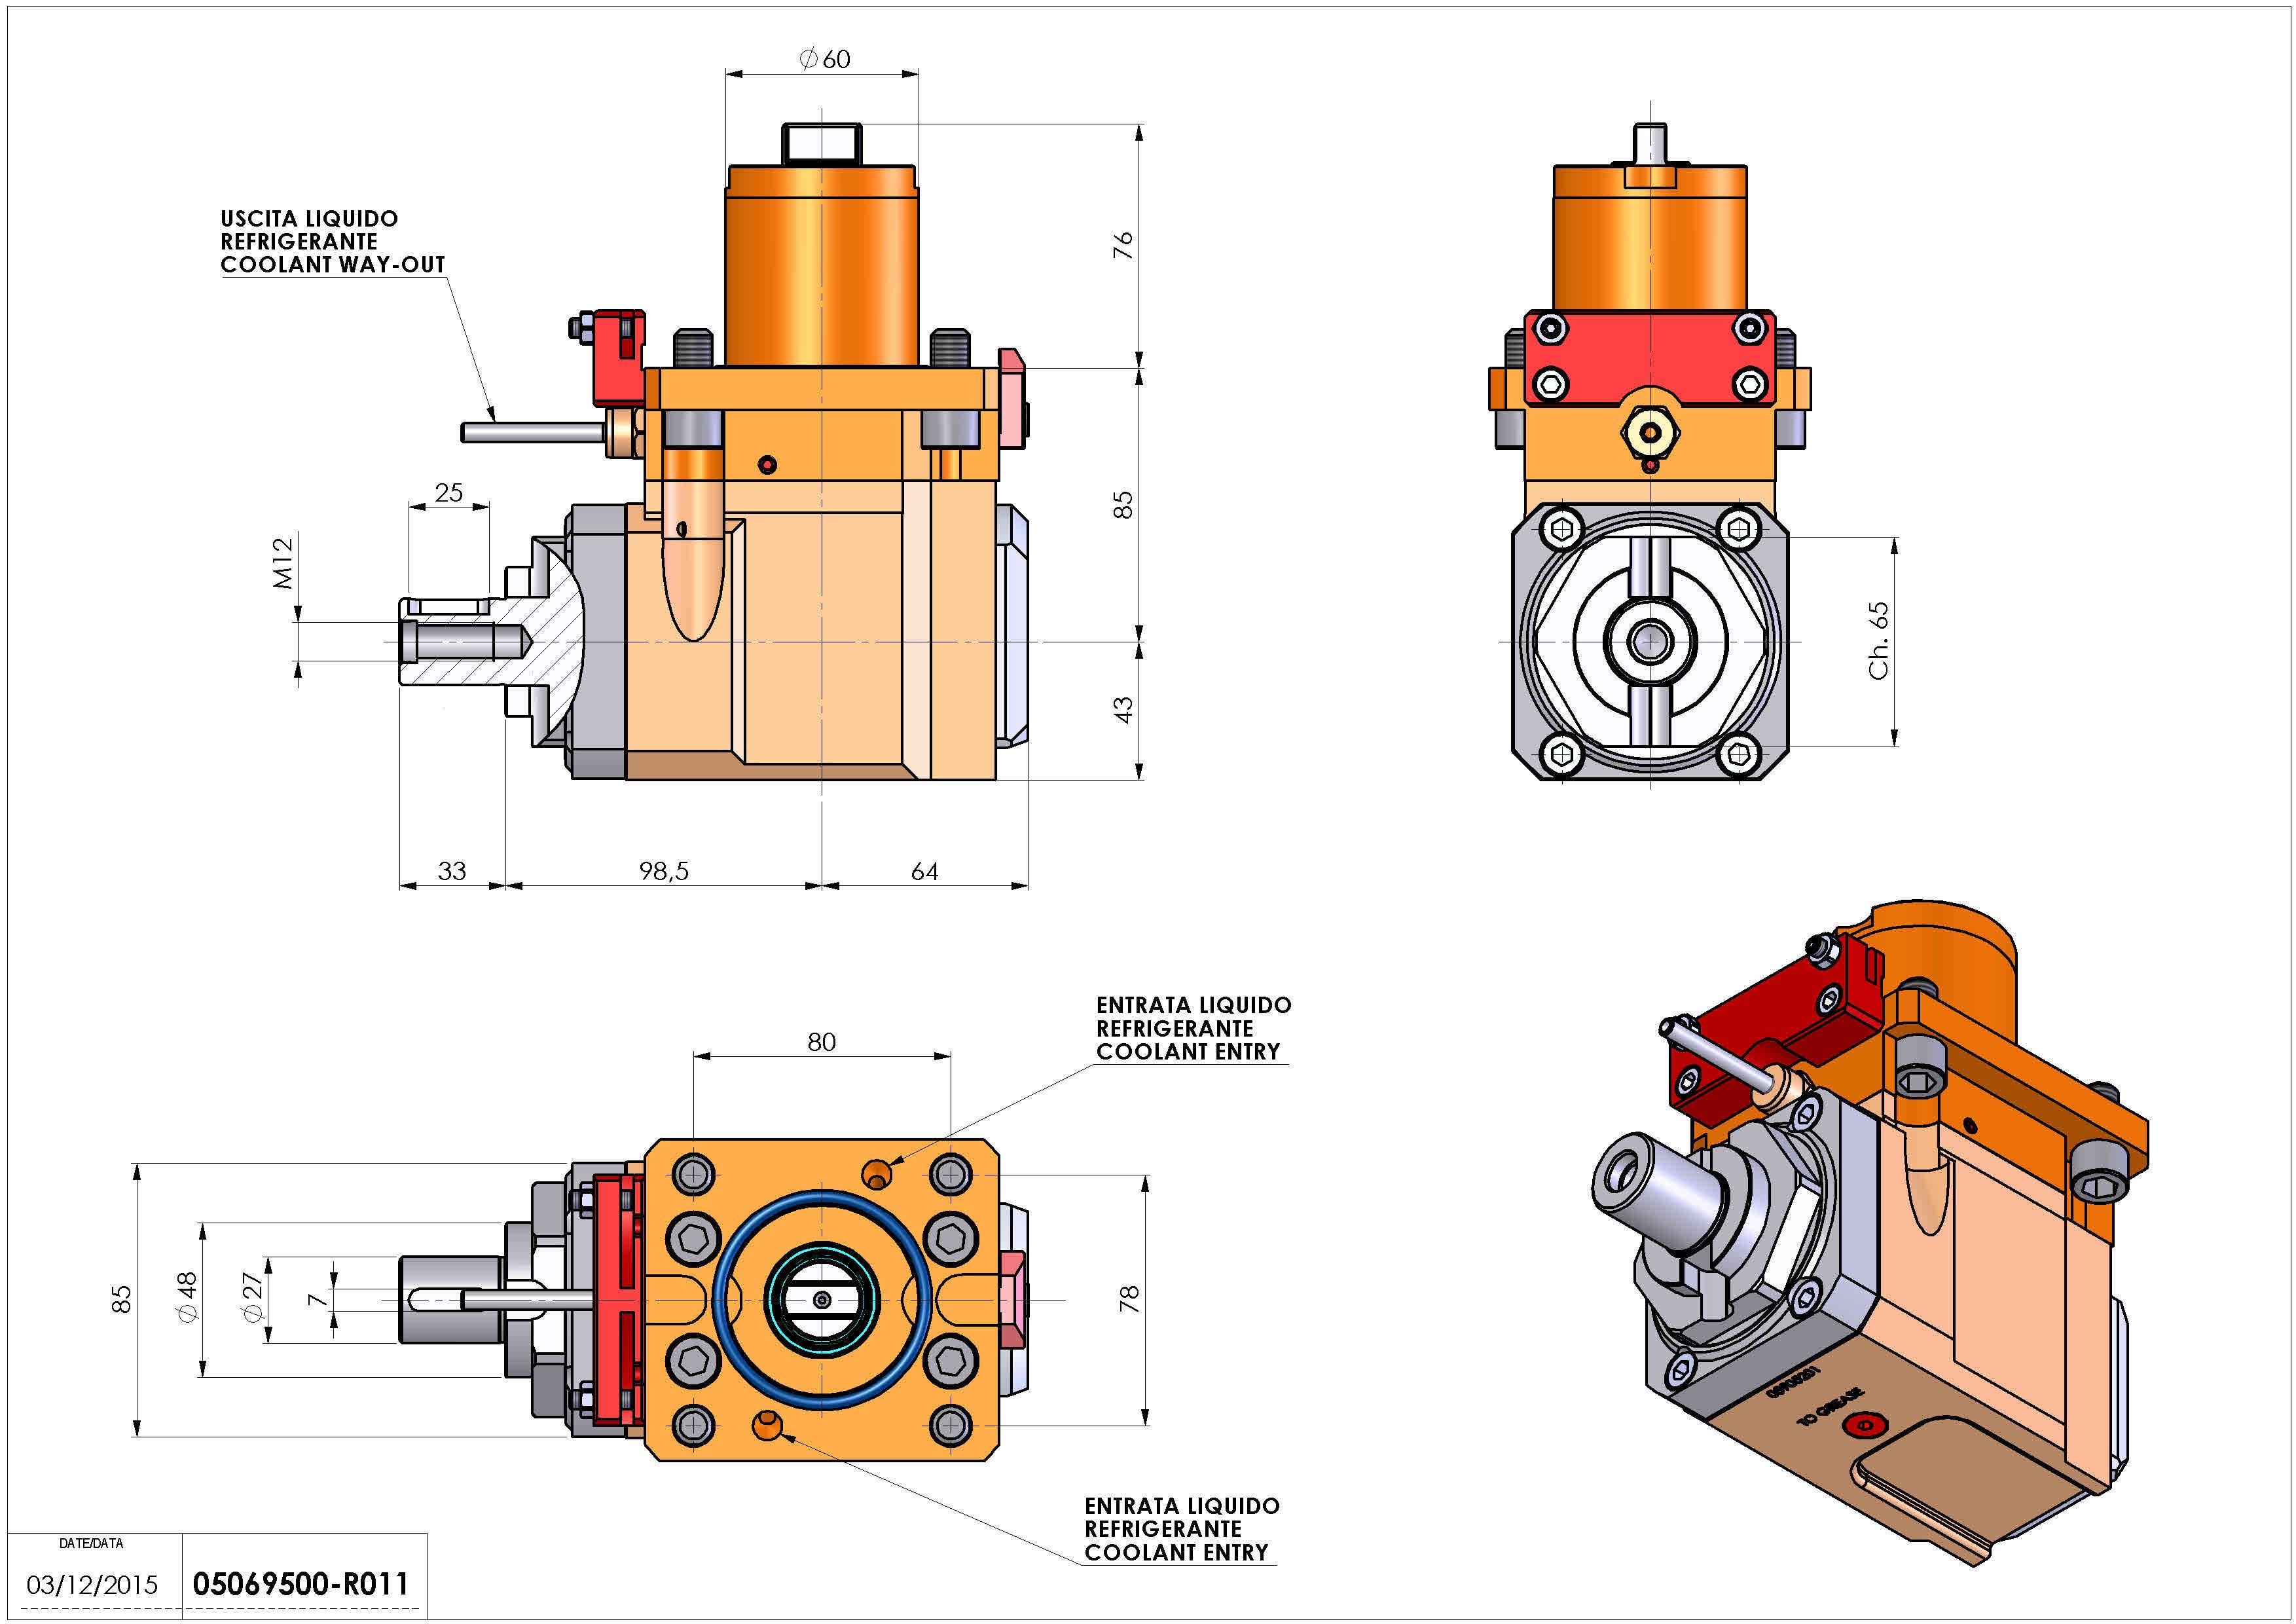 Technical image - LT-A D60 DIN138-27 H85 OK OKUMA LB-300 MW MWY.